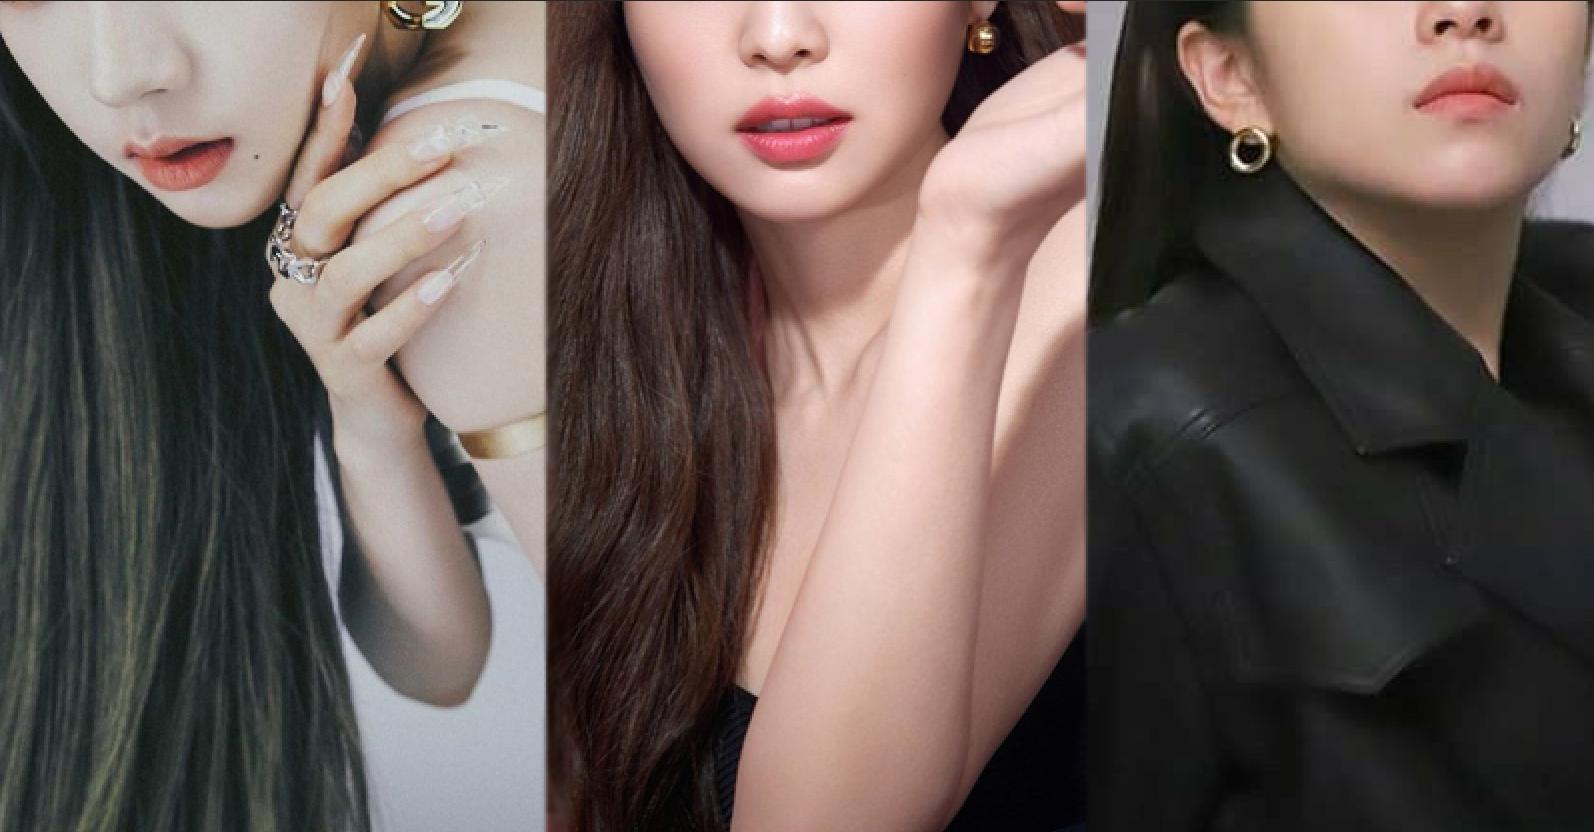 Top 10 Most Popular Female K-Pop Idols for June 2021